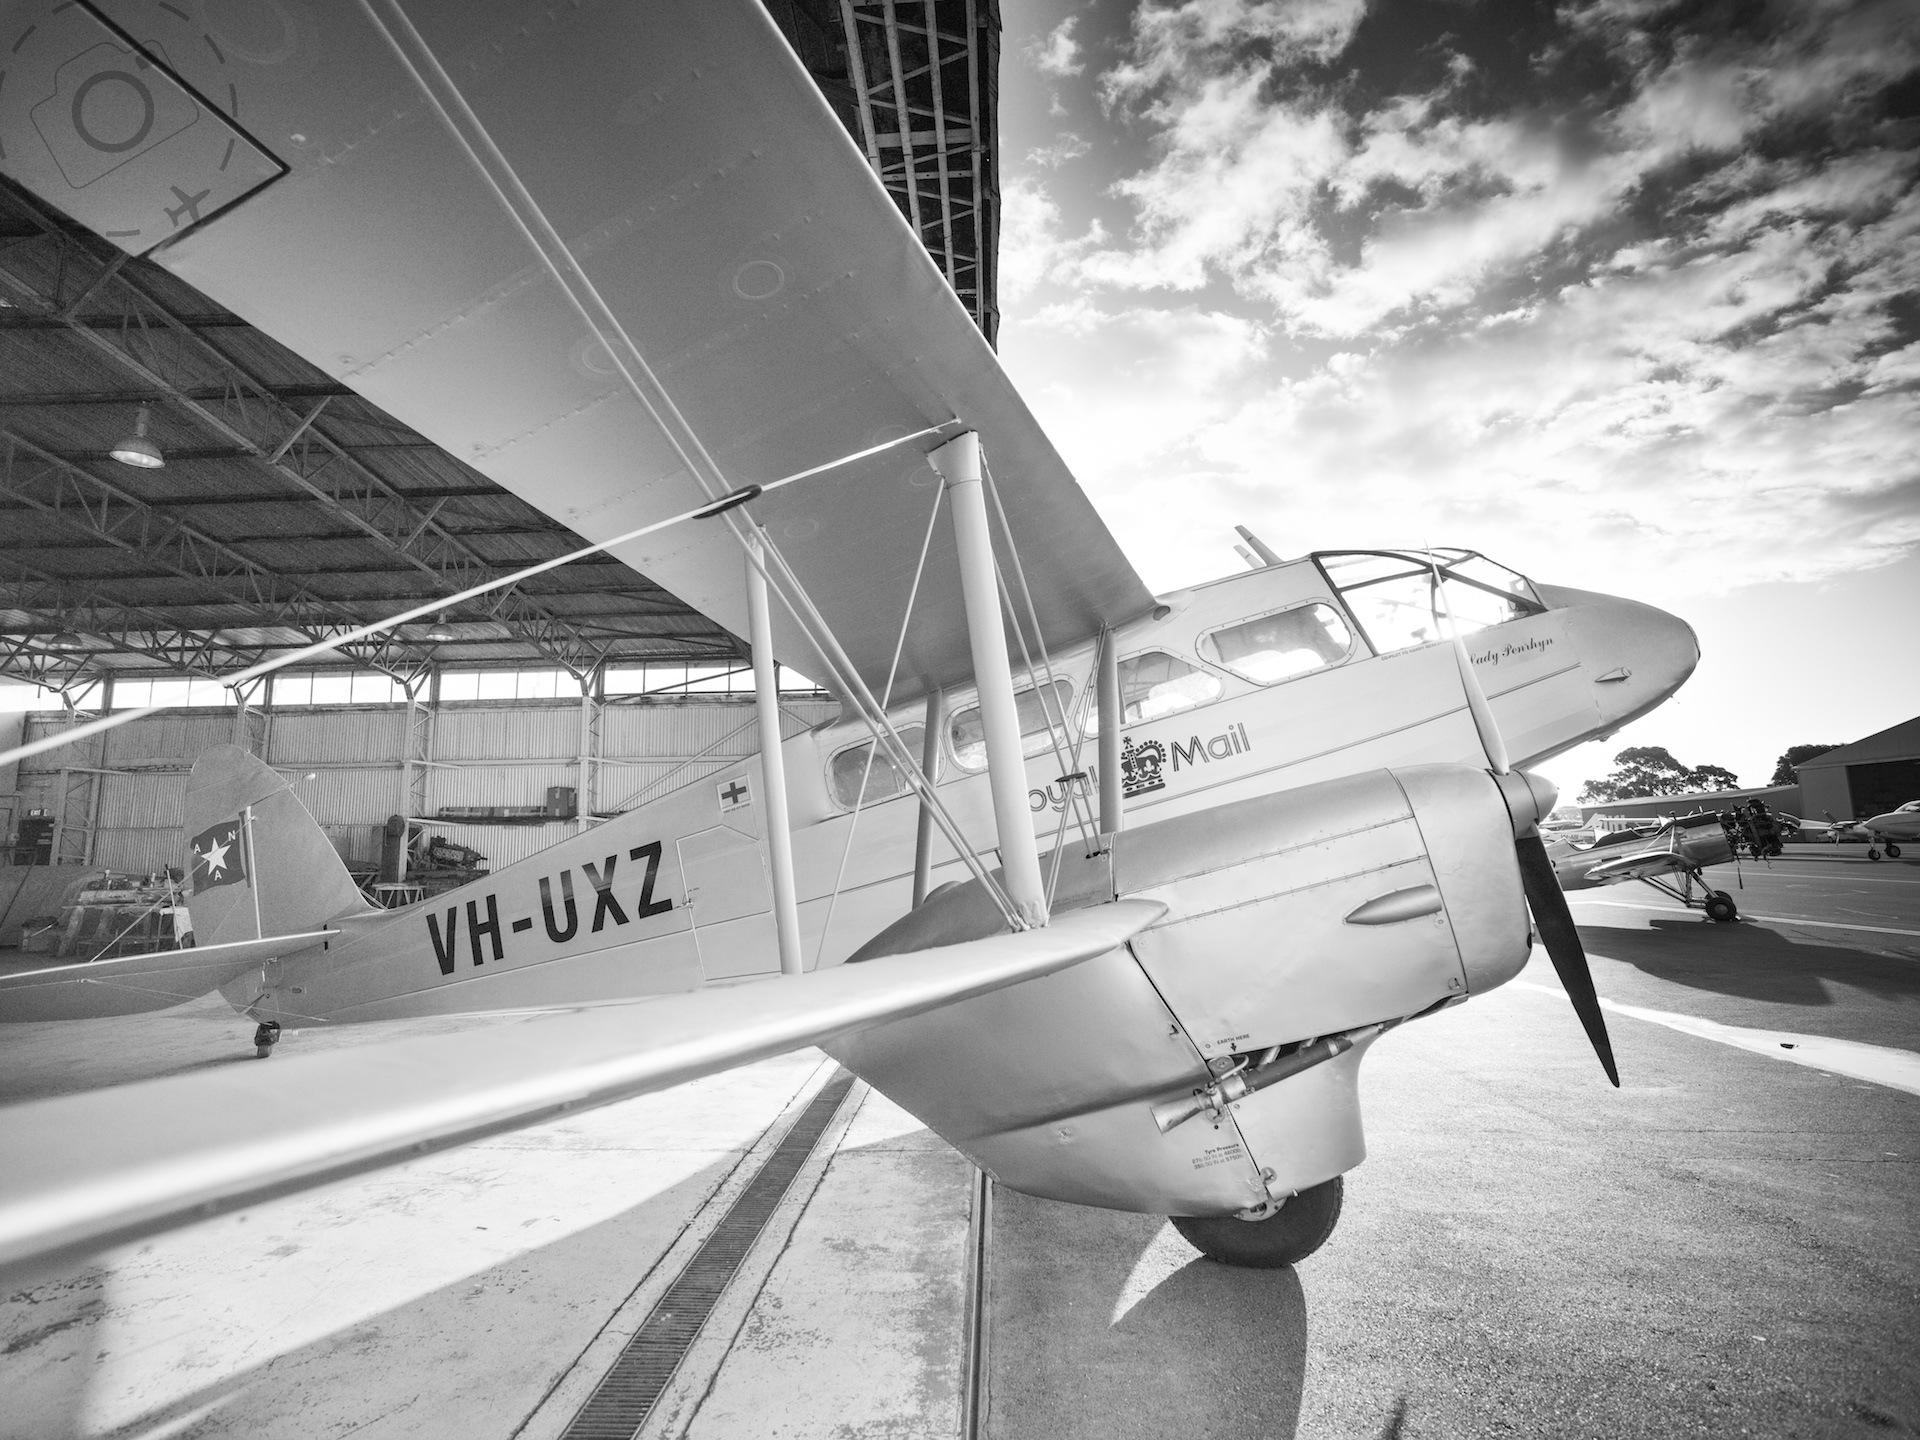 Photographers on a Plane